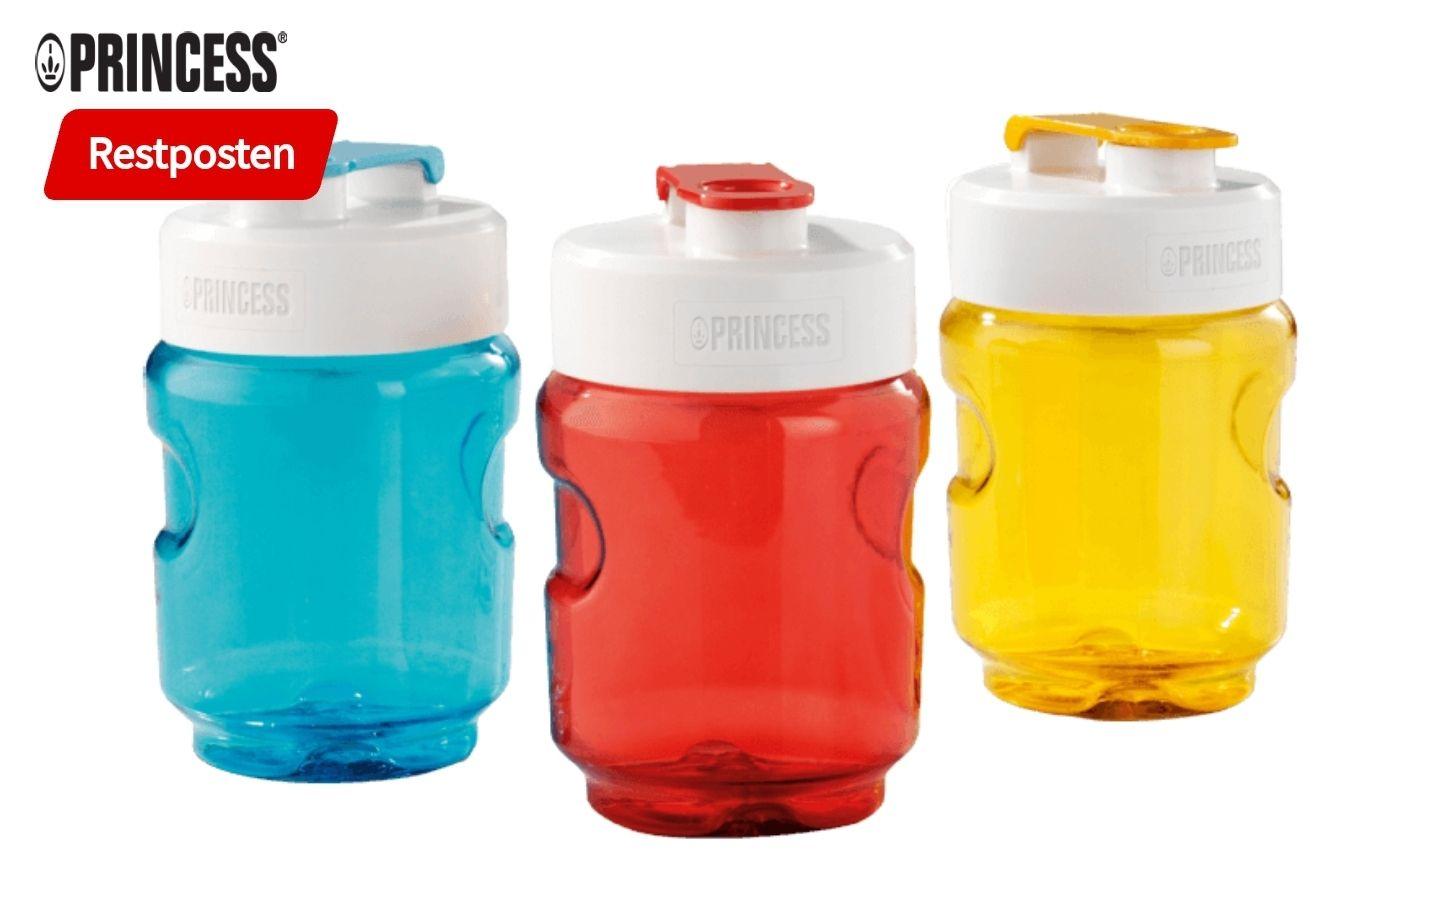 Princess 217402 Bottle2go Trinkflasche 0,3l blau, rot, gelb